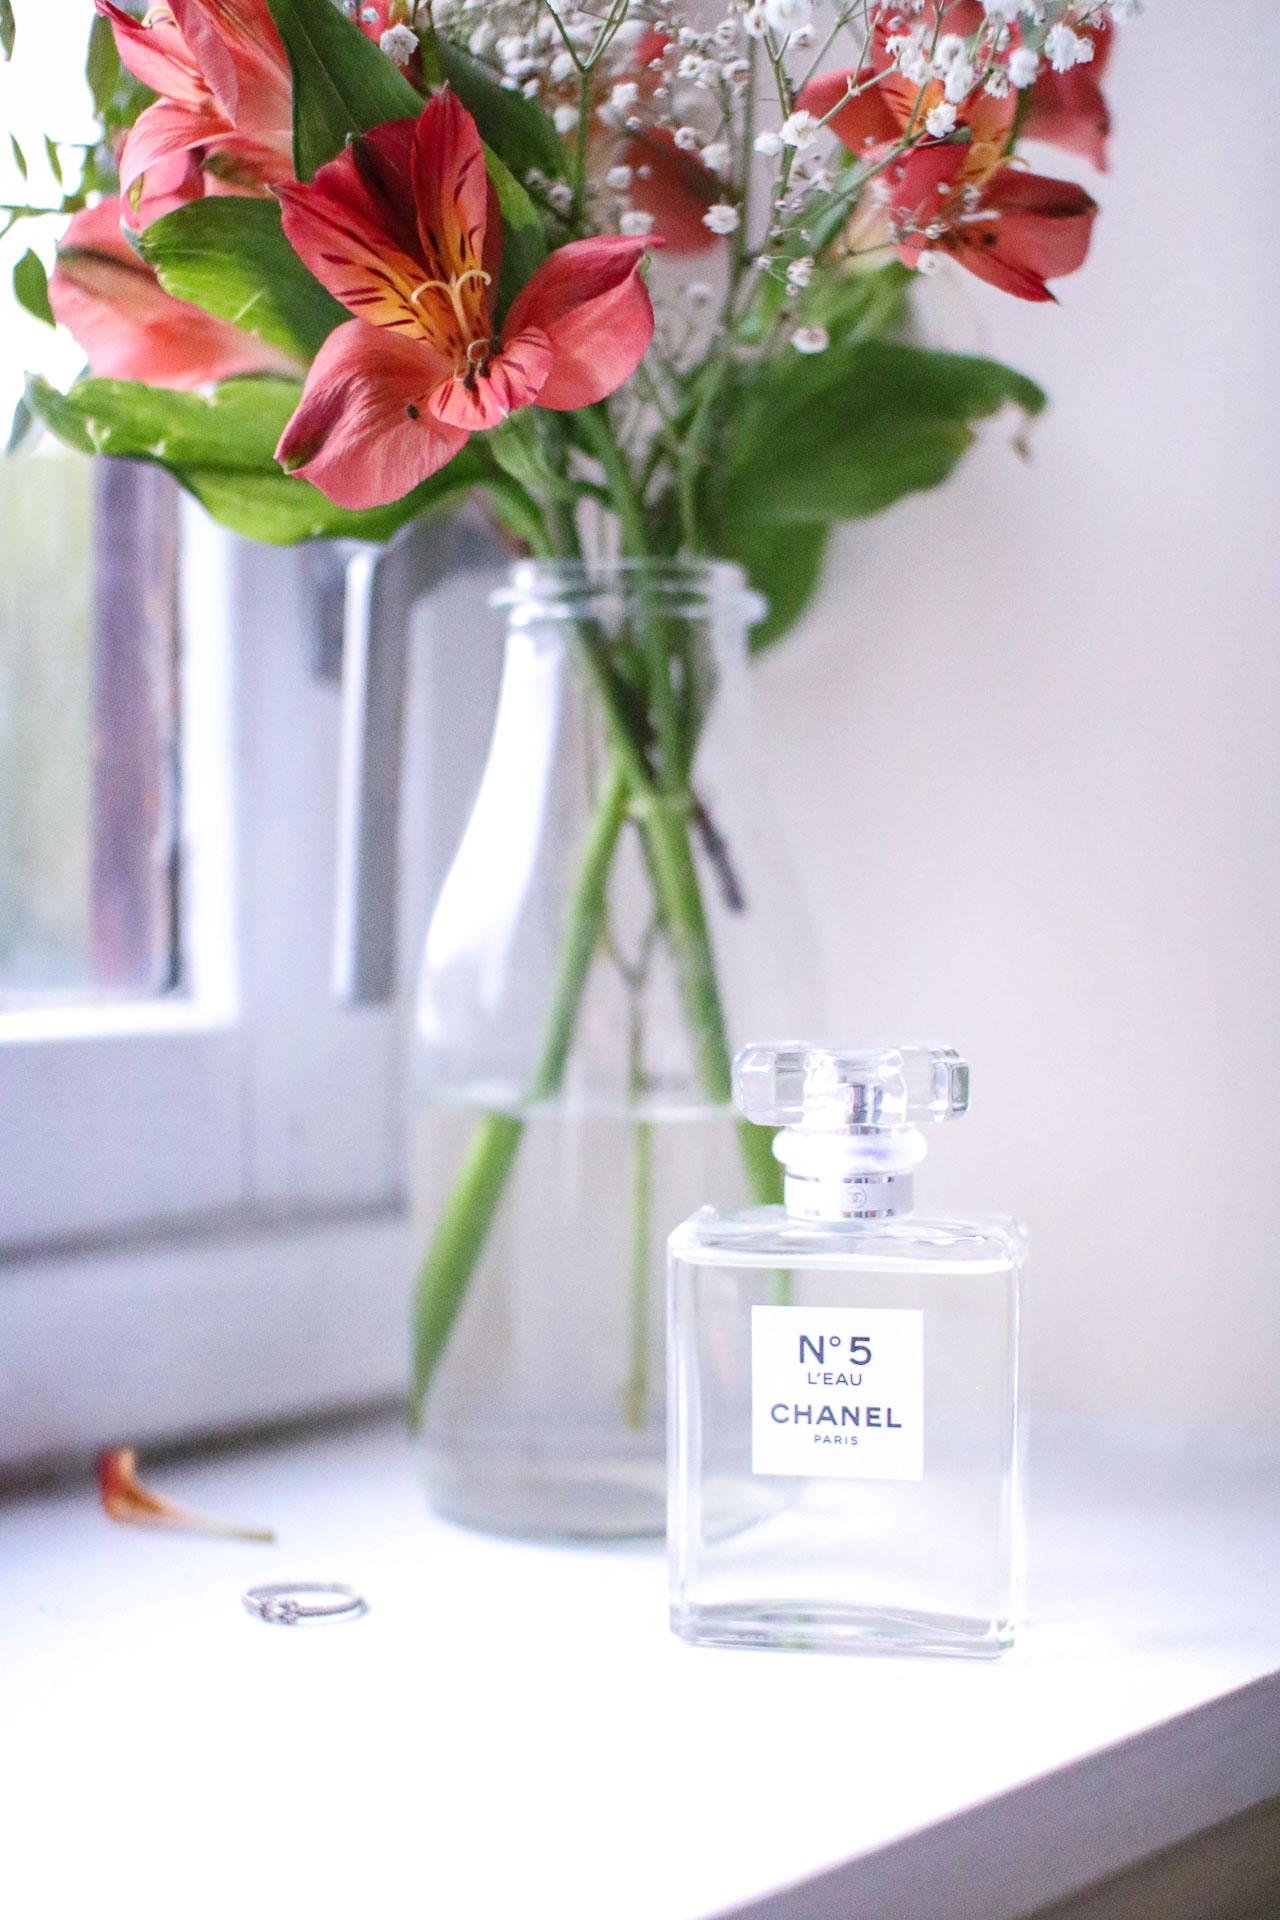 chanel no 5 l'eau review perfume 2